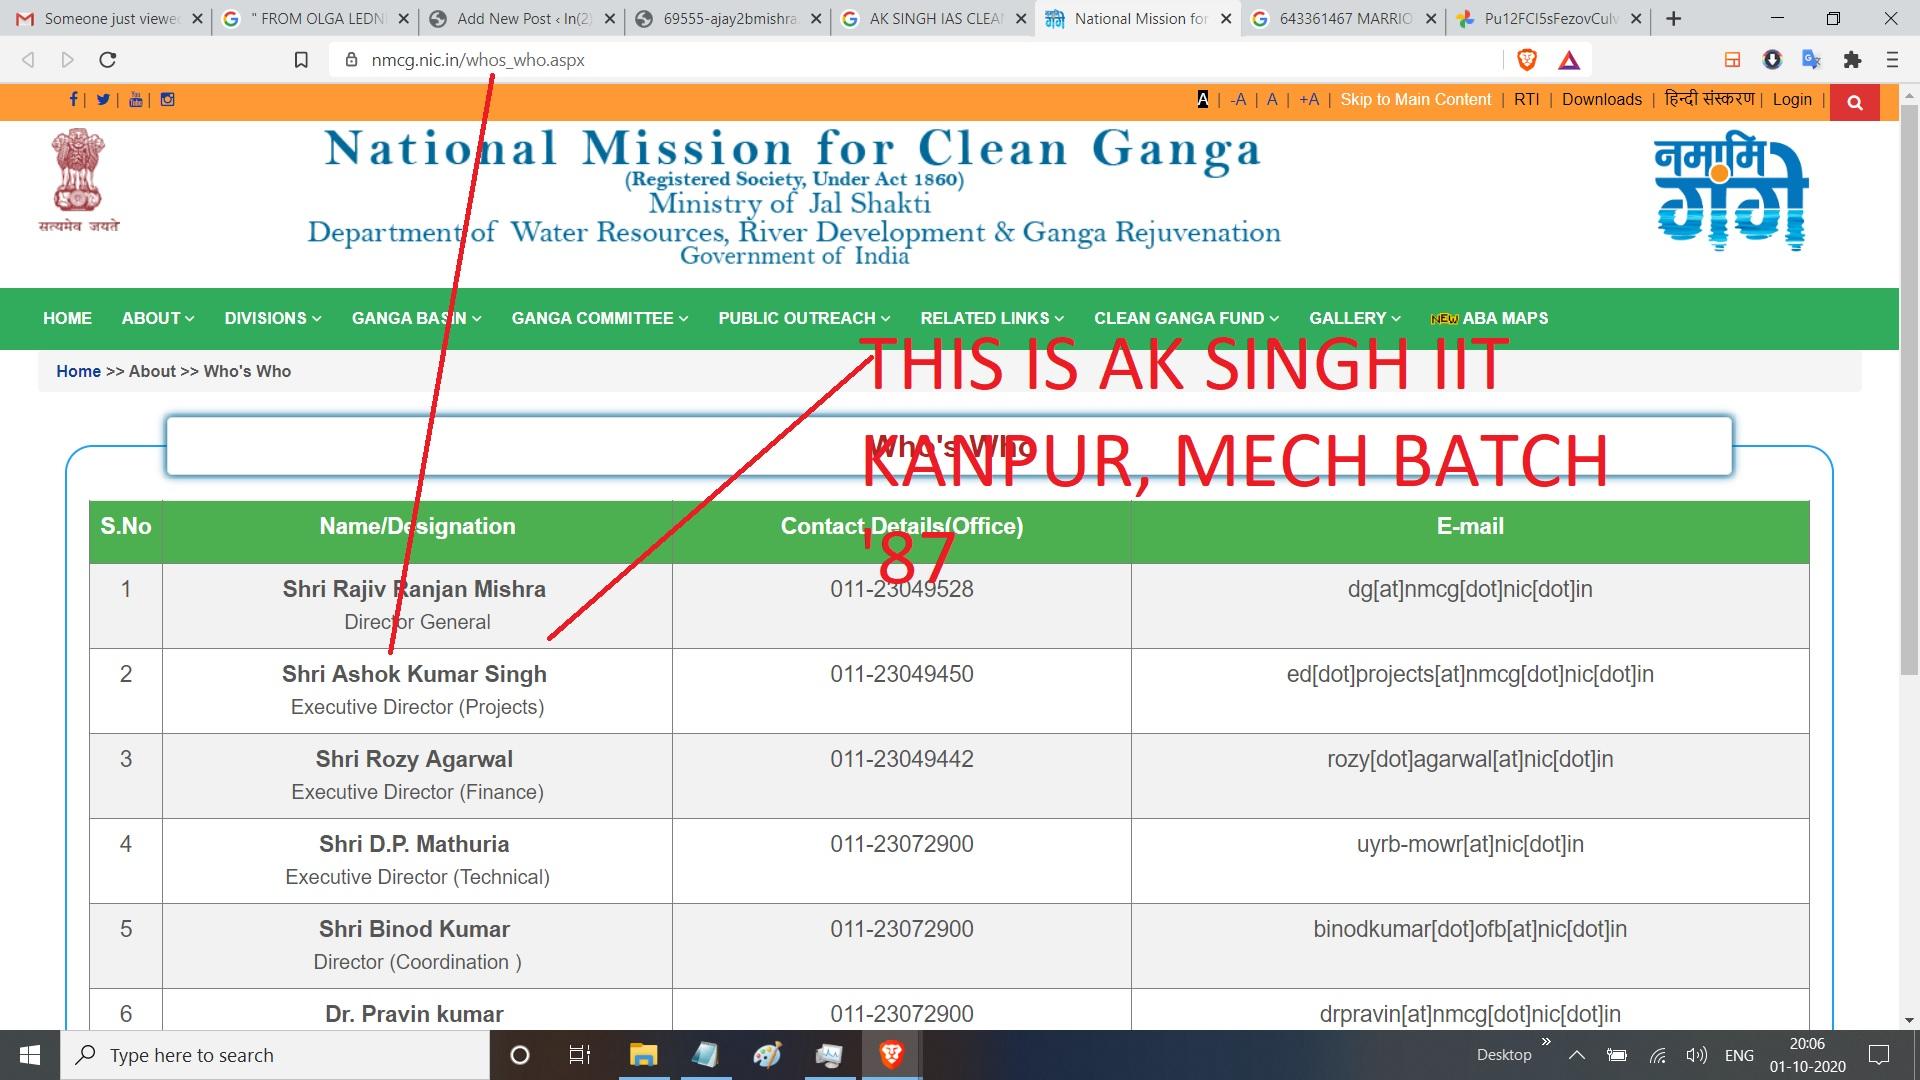 AK SNIGH GANGA CLEAN PROJECT -REGARDS AJAY - MISHRA - IIT K